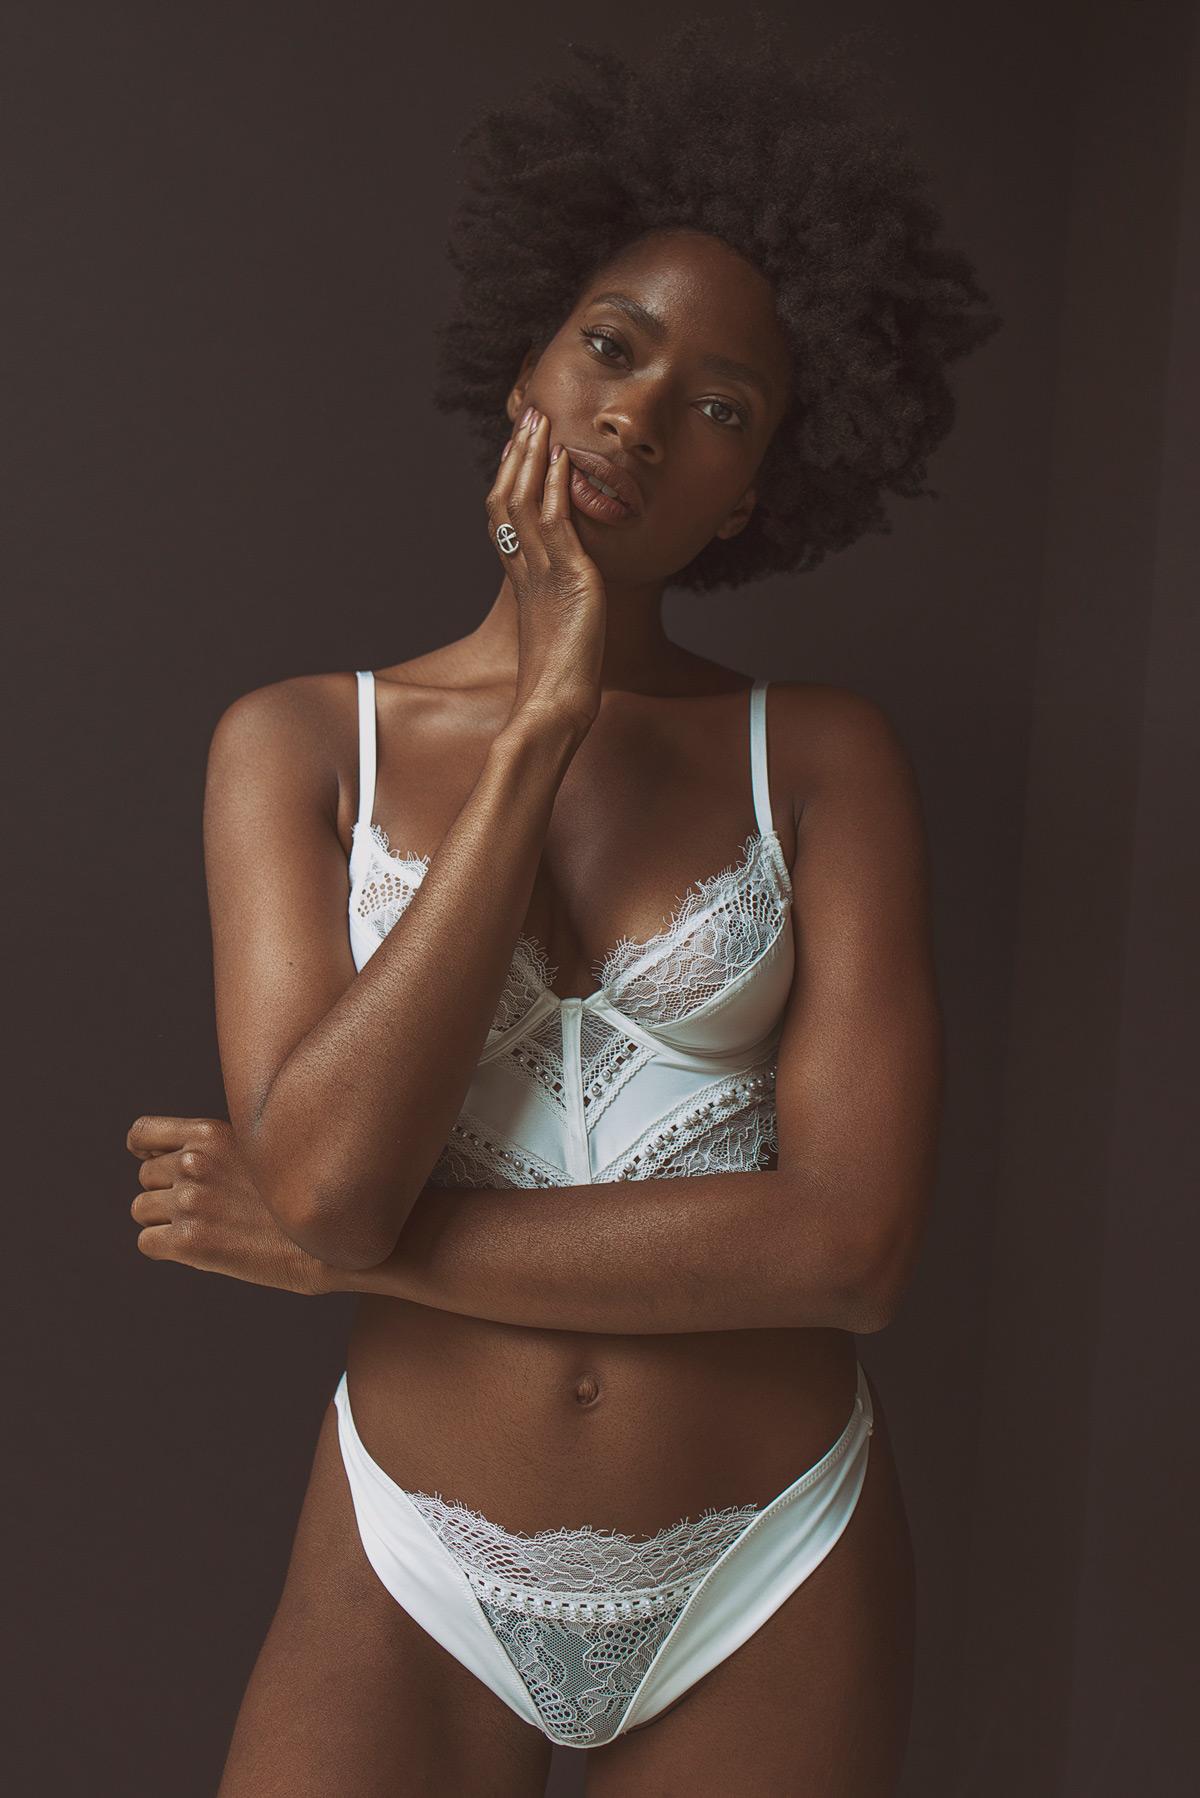 MirzaBabic-intimimates-lingerie-studio-photography-color-web4.jpg